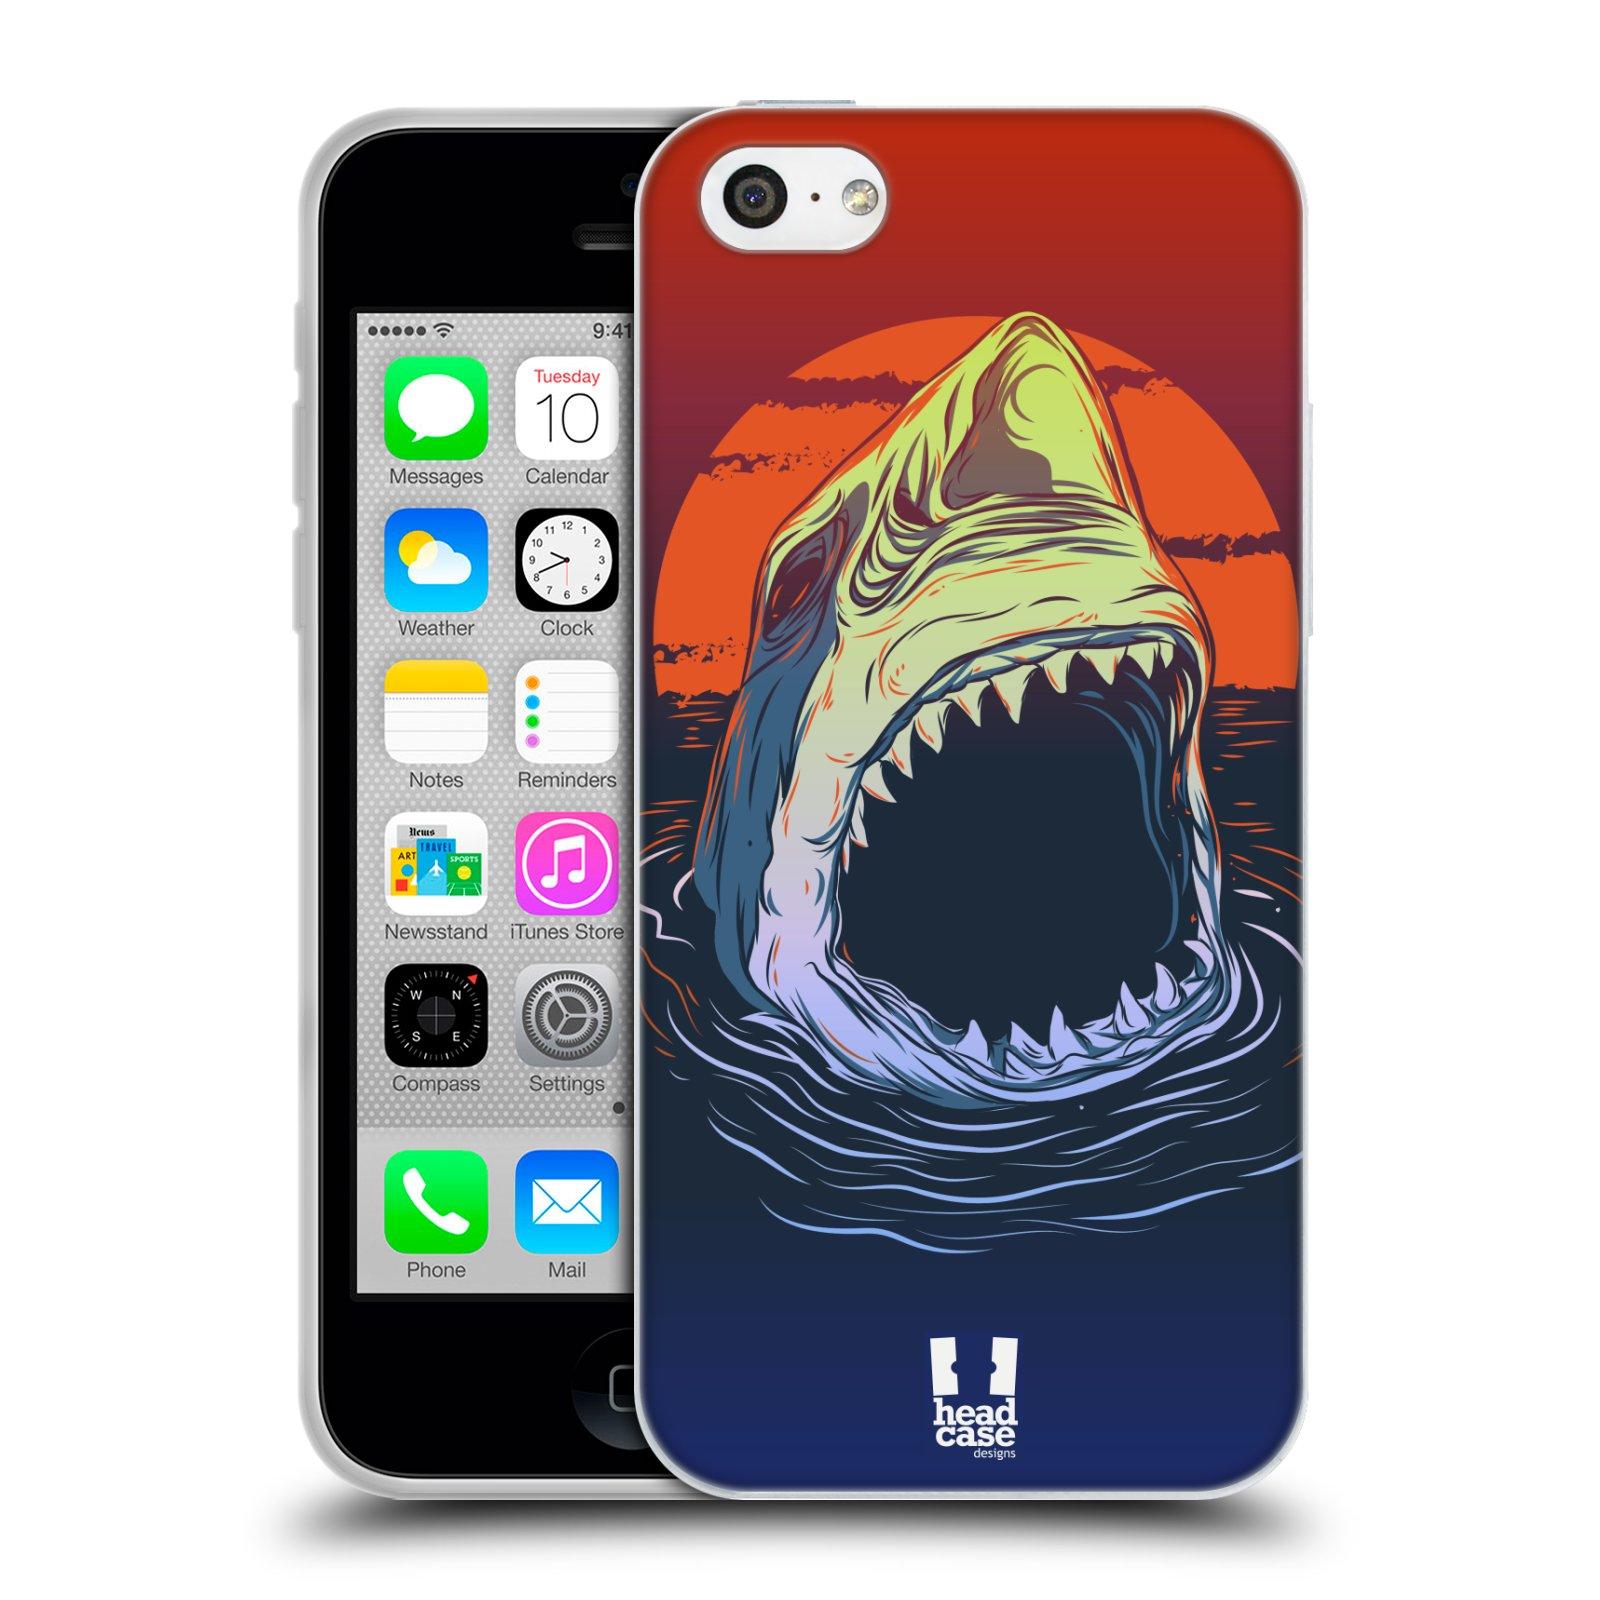 HEAD CASE silikonový obal na mobil Apple Iphone 5C vzor mořská monstra žralok